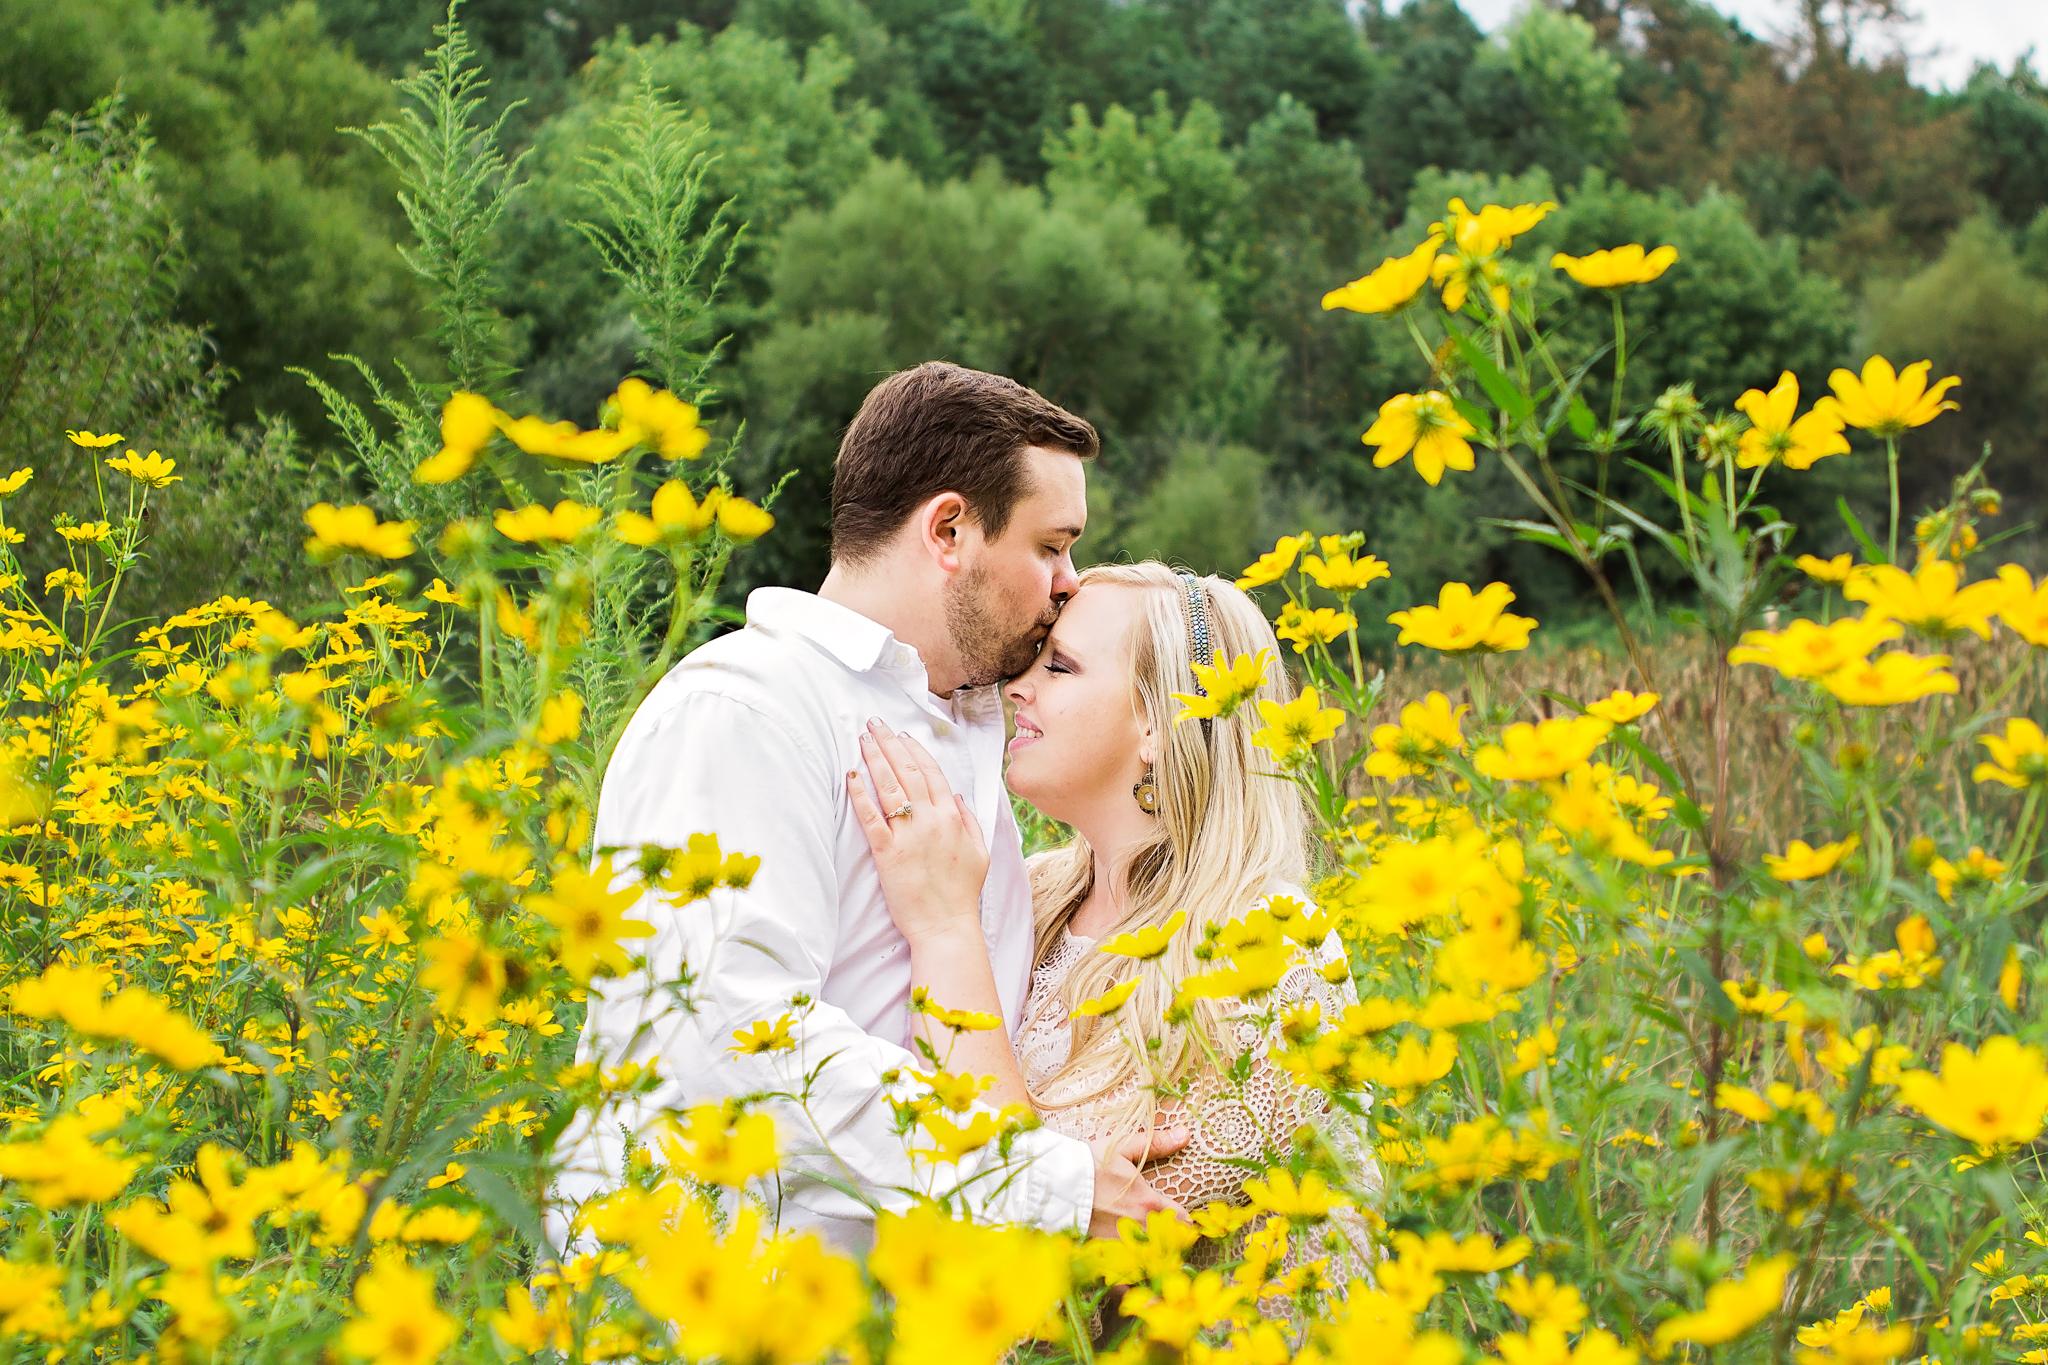 Richmond Kentucky Engagement Photographer - Ariana Jordan Photography -10.jpg